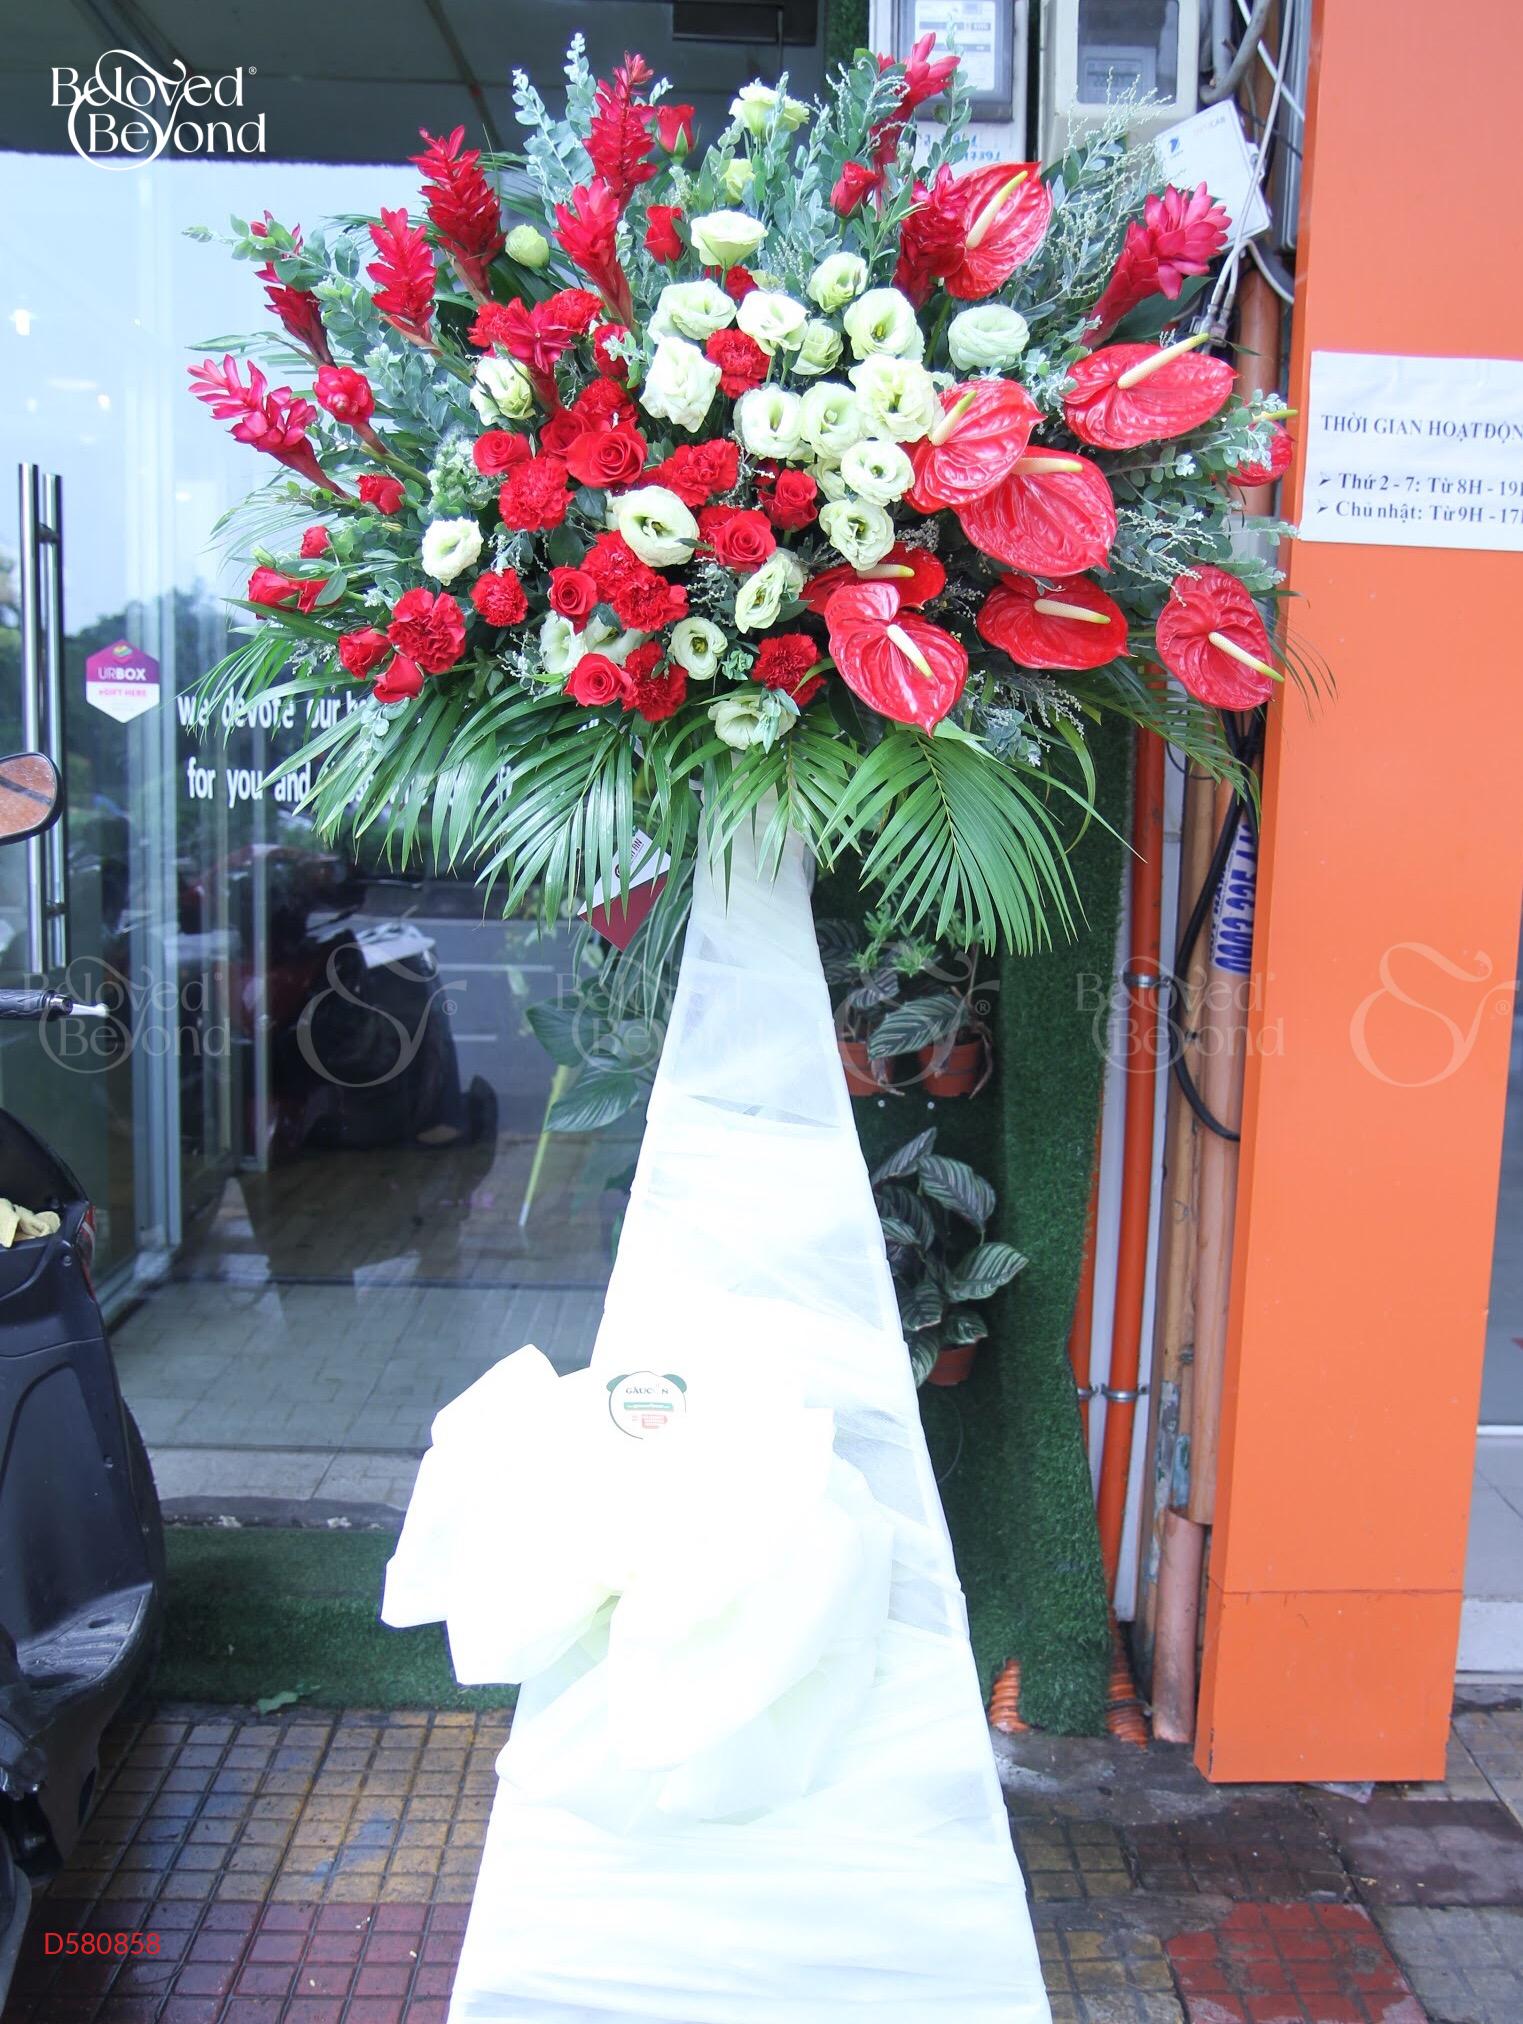 Grand Opening Flowers - D580858 - xinhtuoi.online